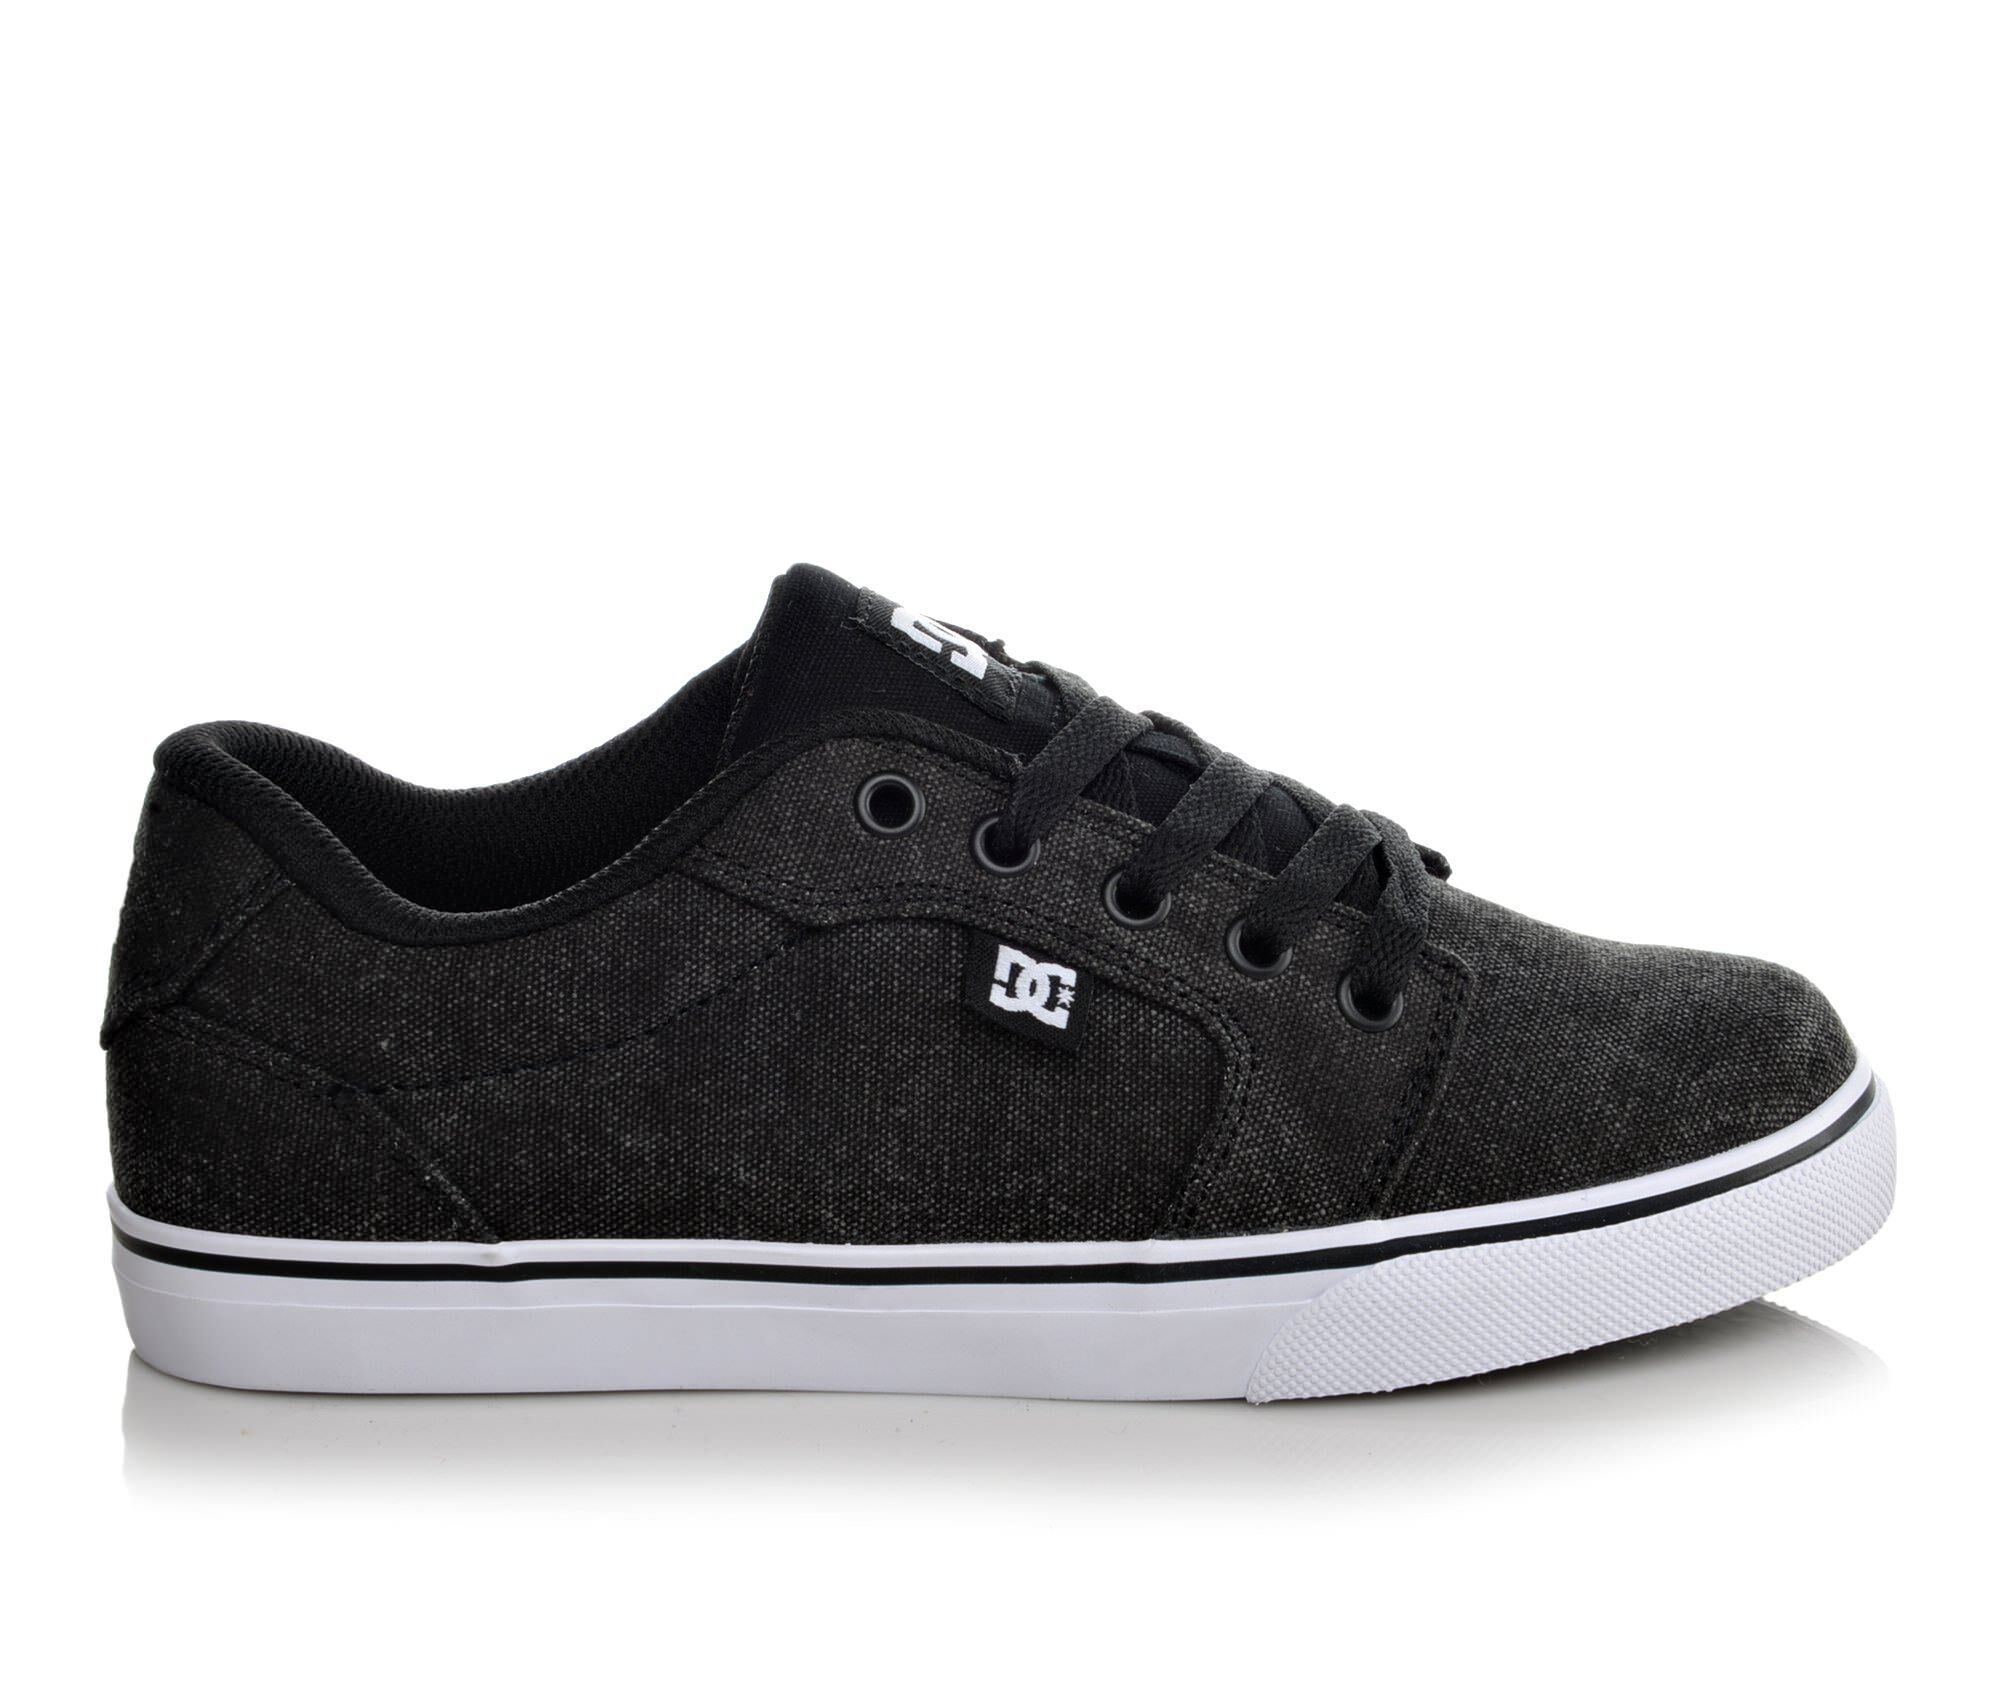 Boys DC Anvil TX SE 1053 Skate Shoes